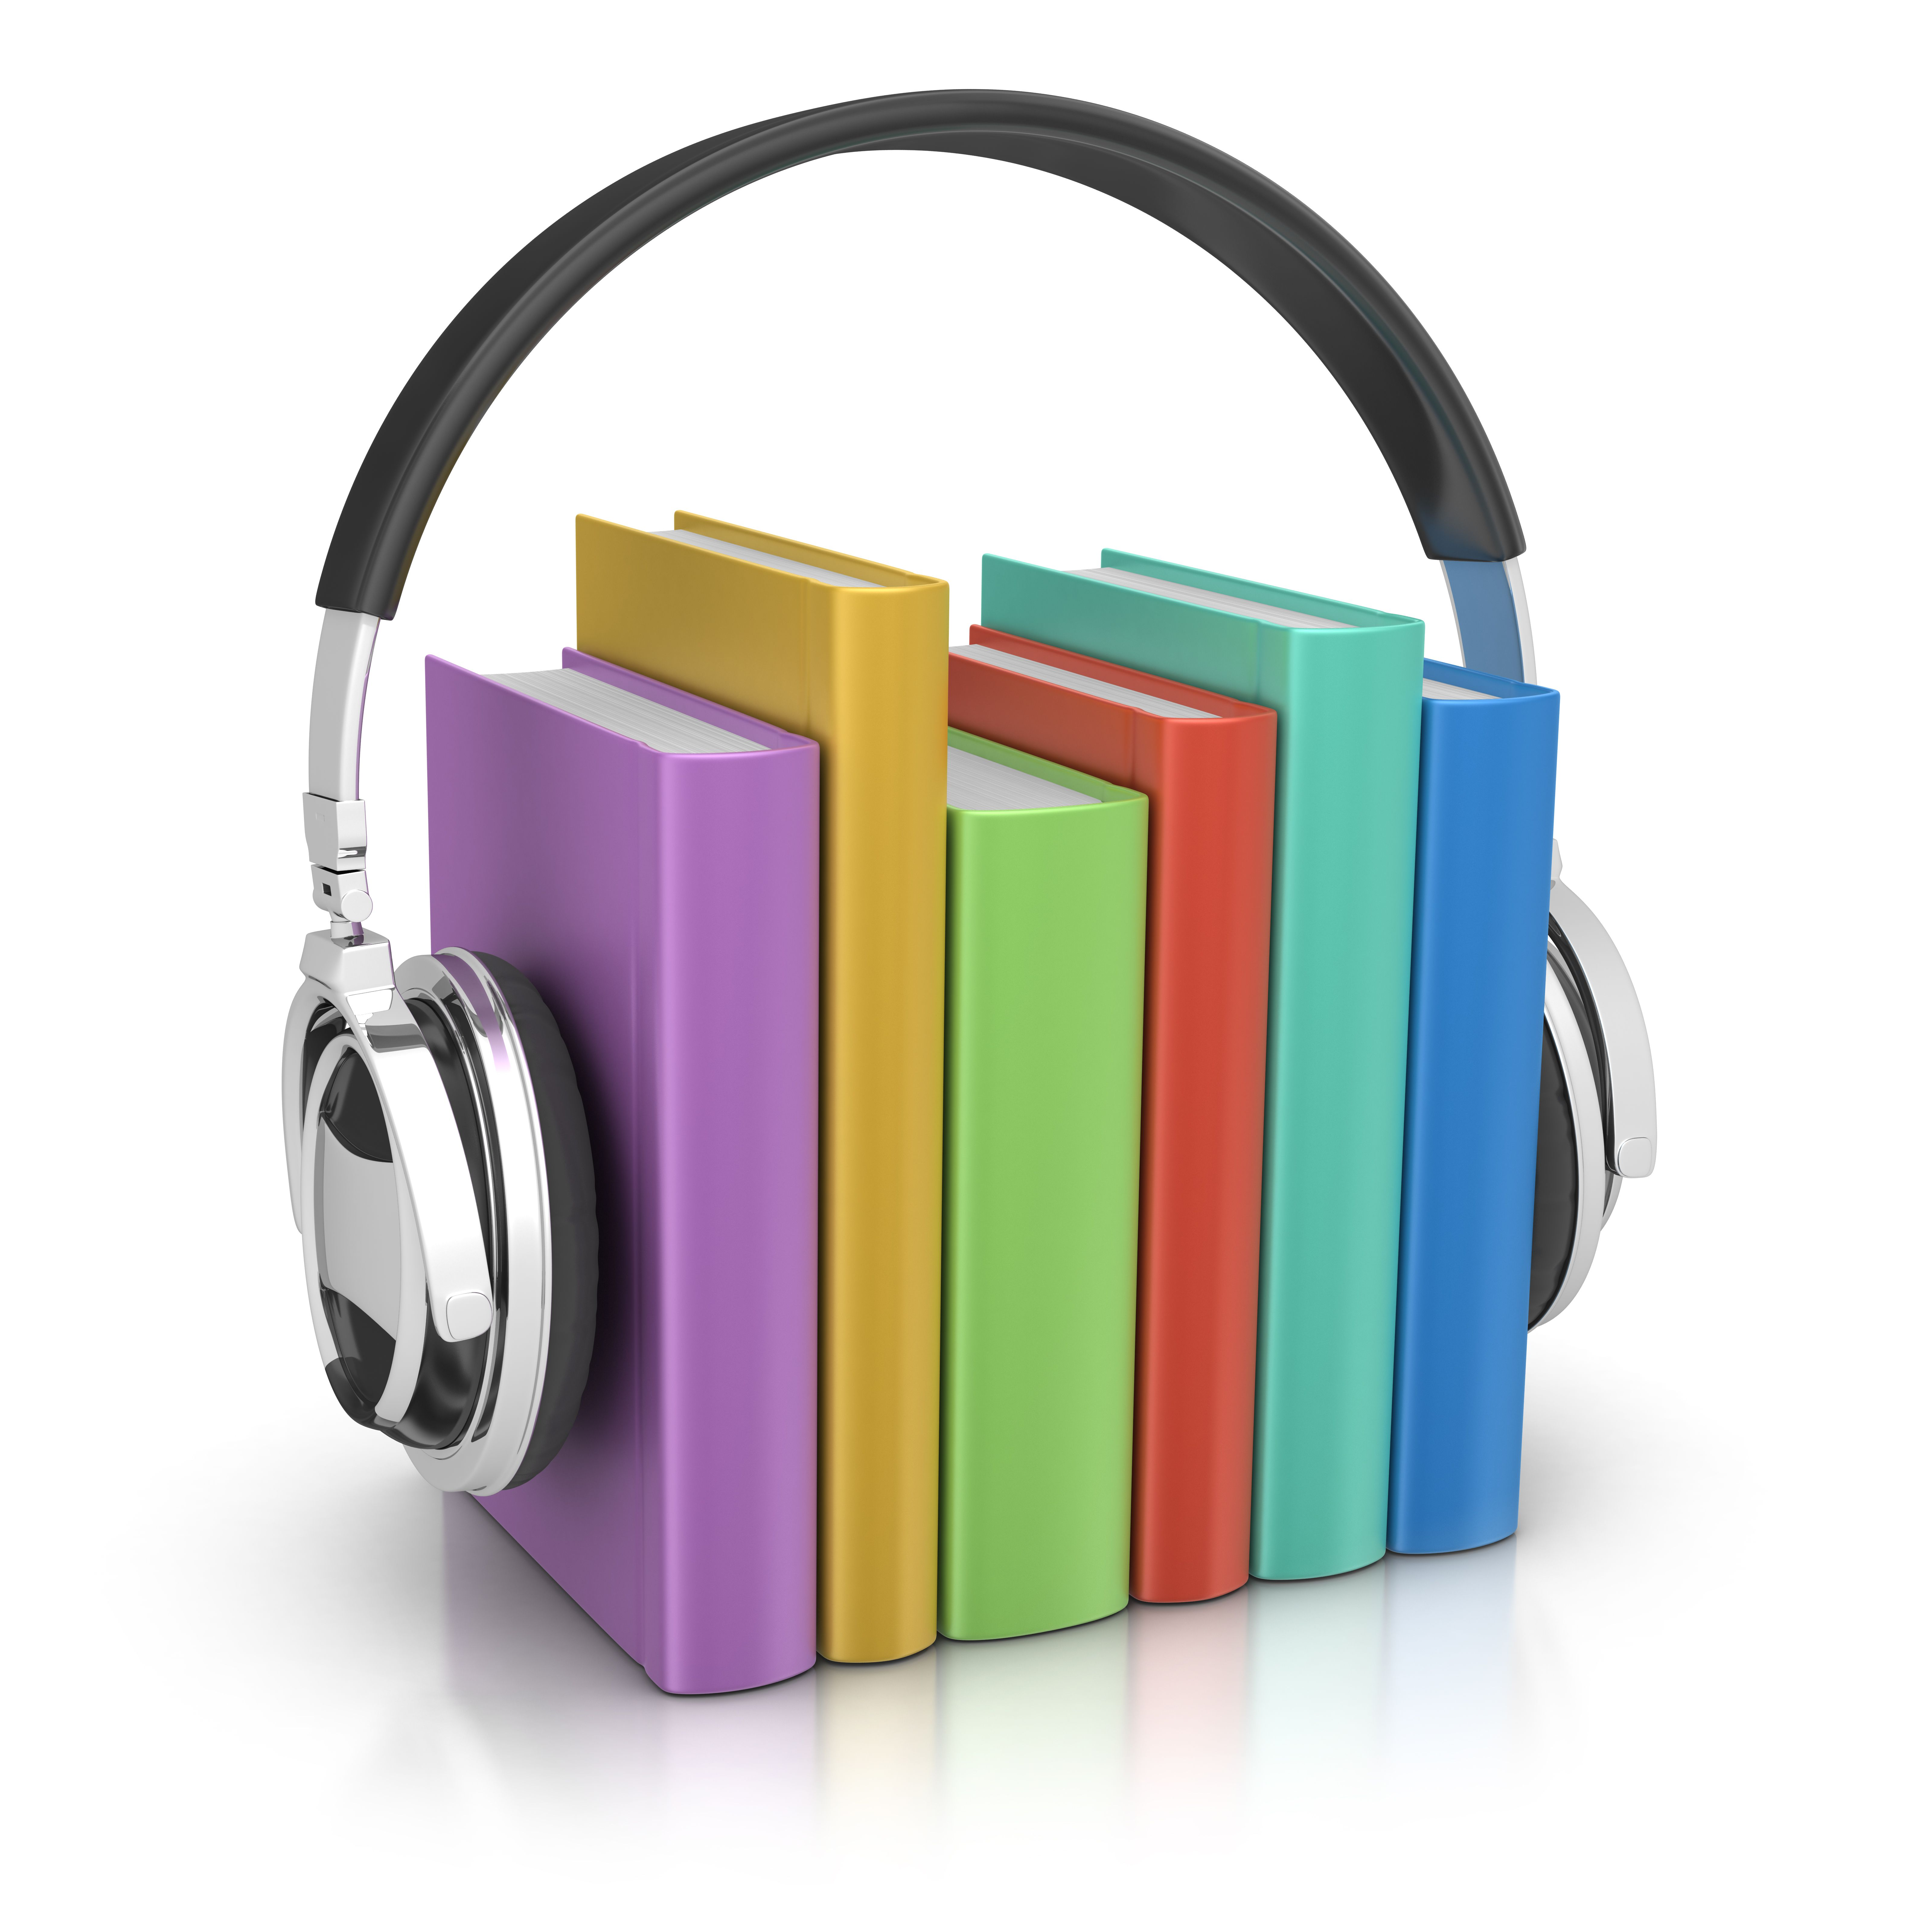 audiobook-concept-183426066-593f30465f9b58d58af1259c